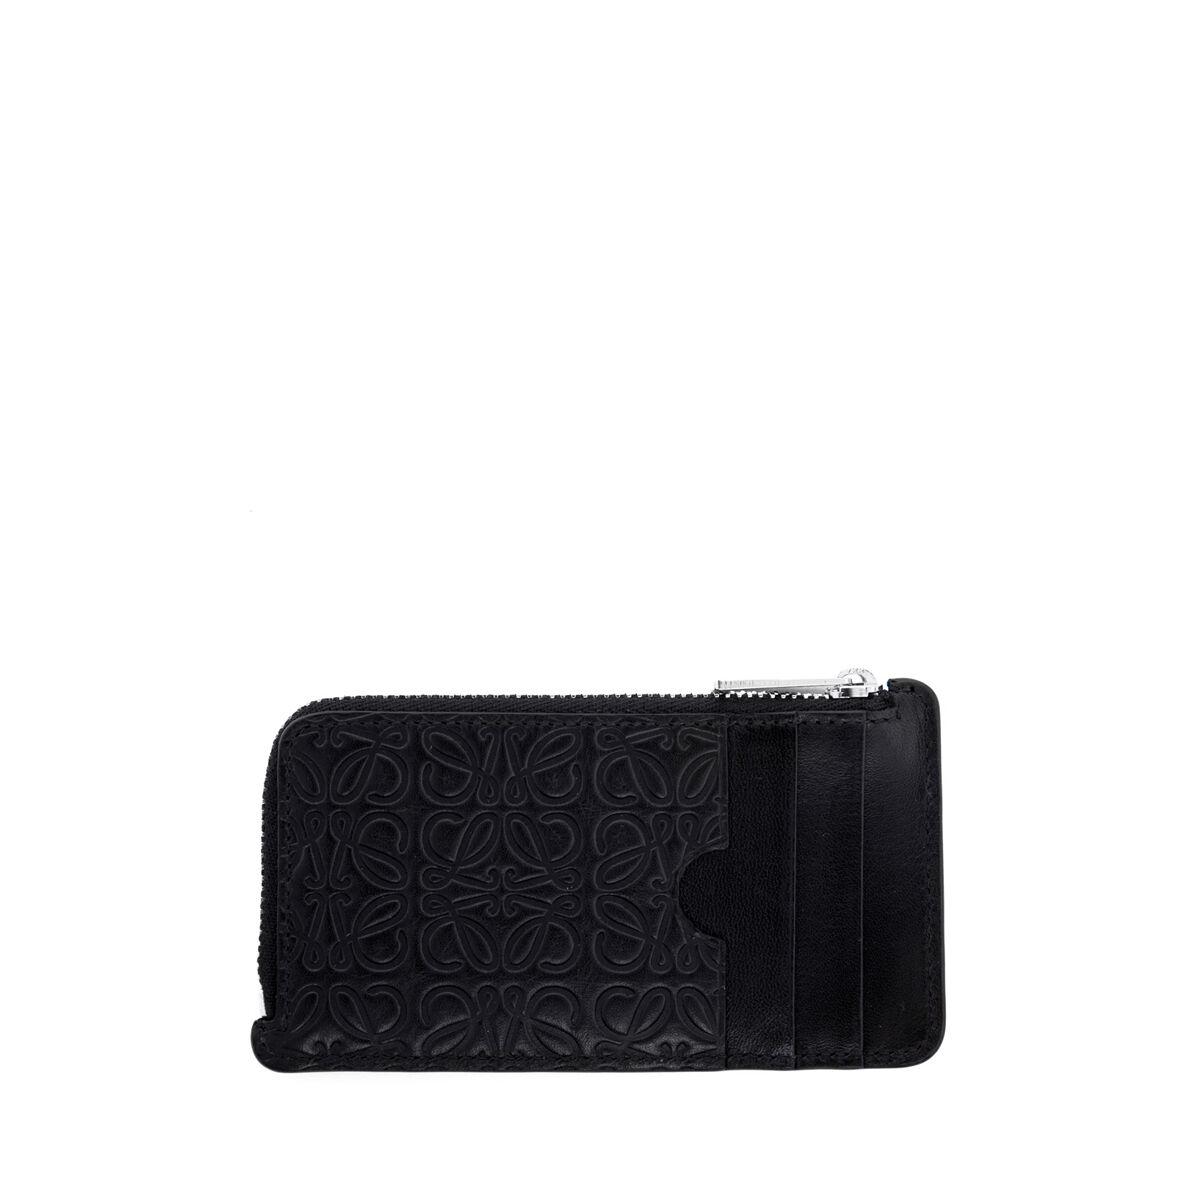 LOEWE Coin/Card Holder Black all